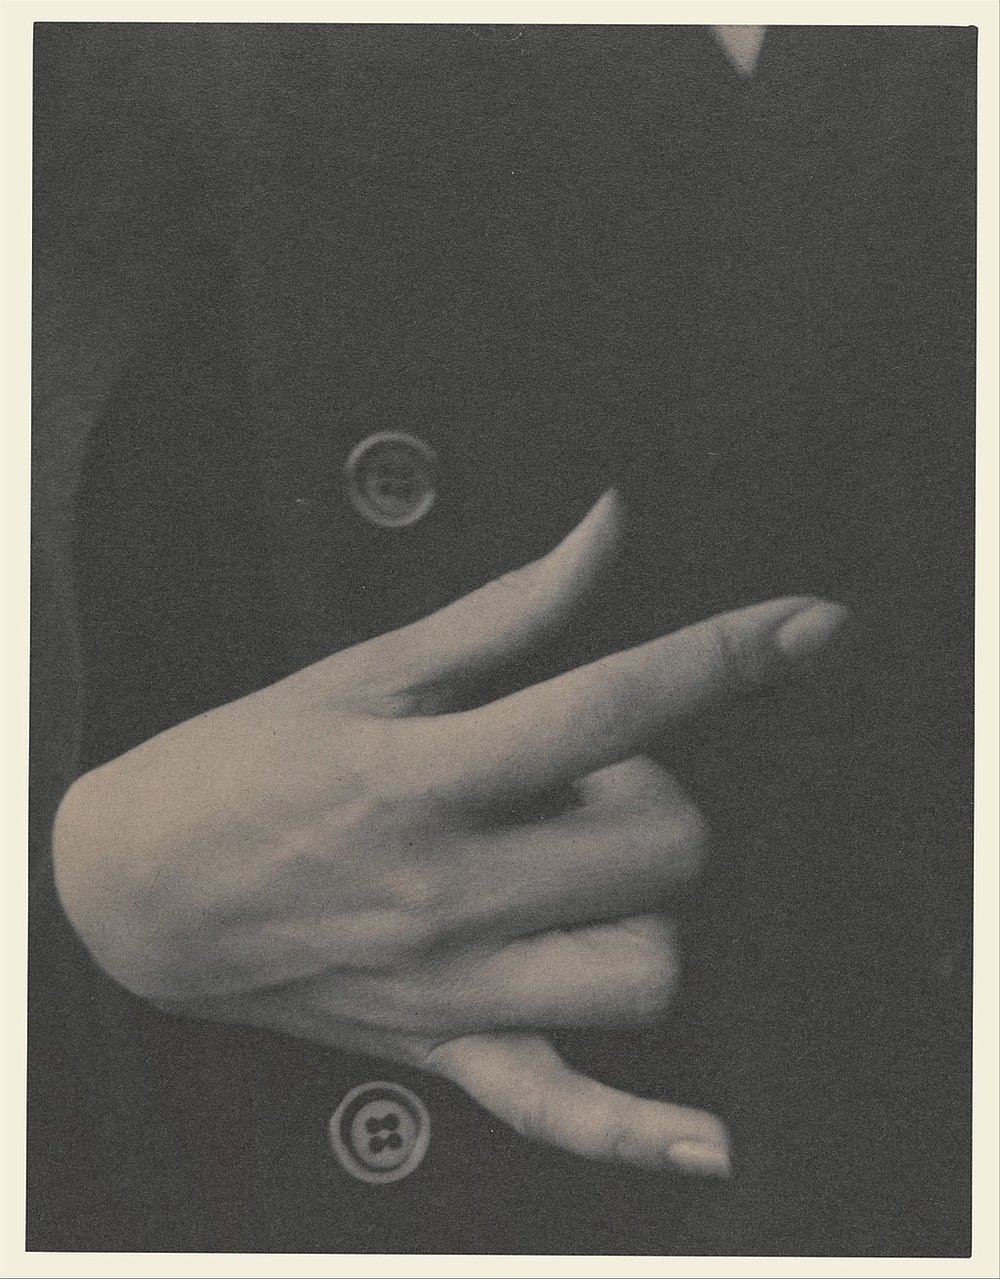 Georgia_O'Keeffe—Hand_MET_DP232997-CC0.jpg